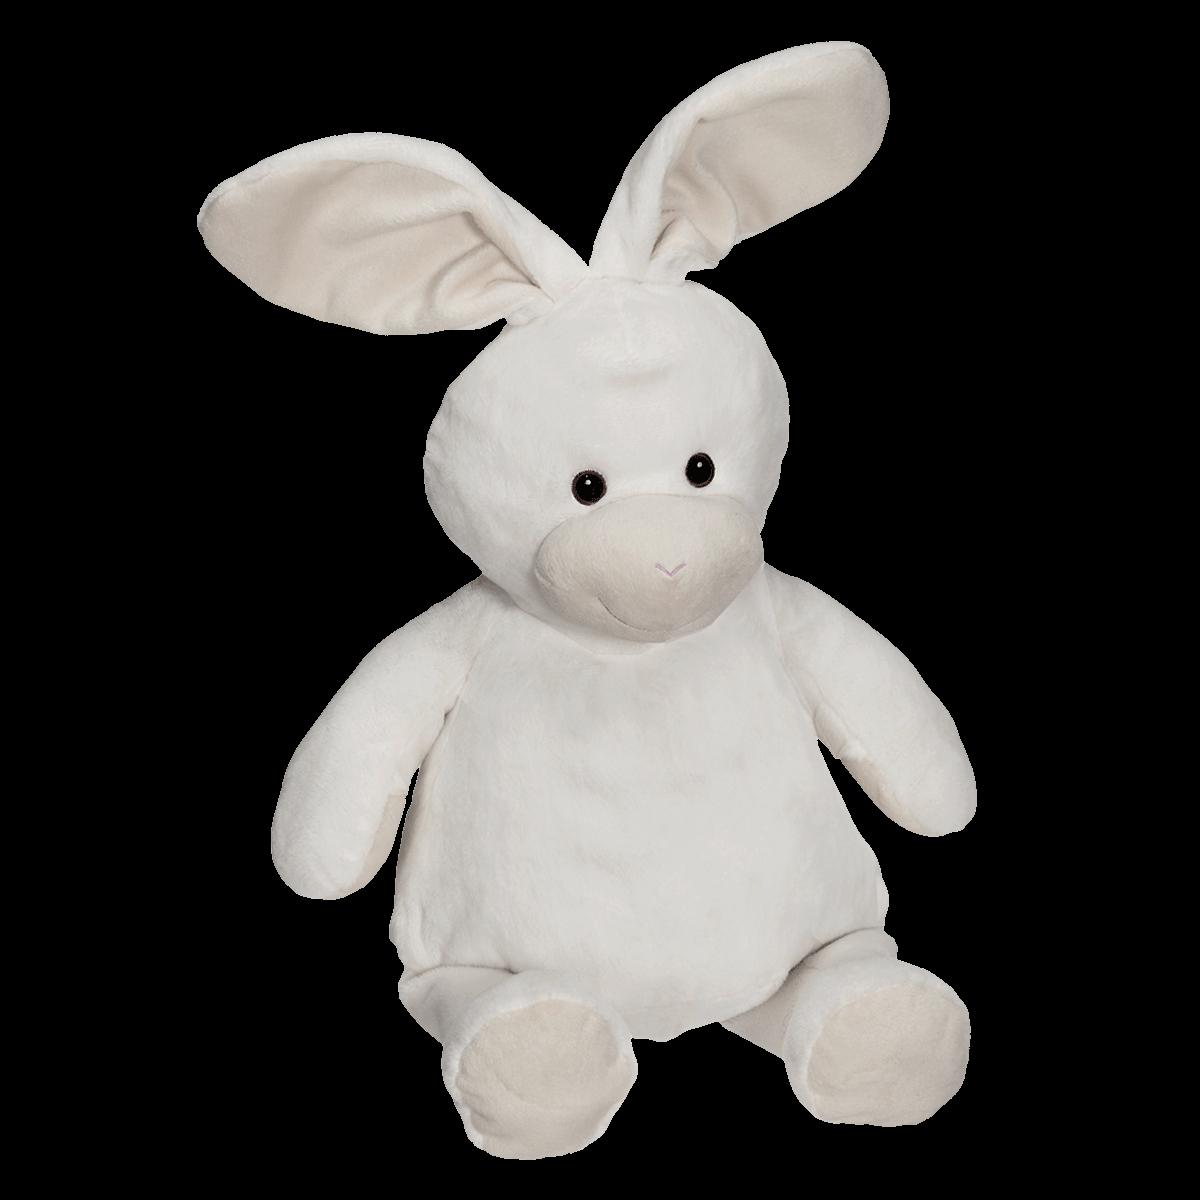 embroider buddy® – Buddy Bunny